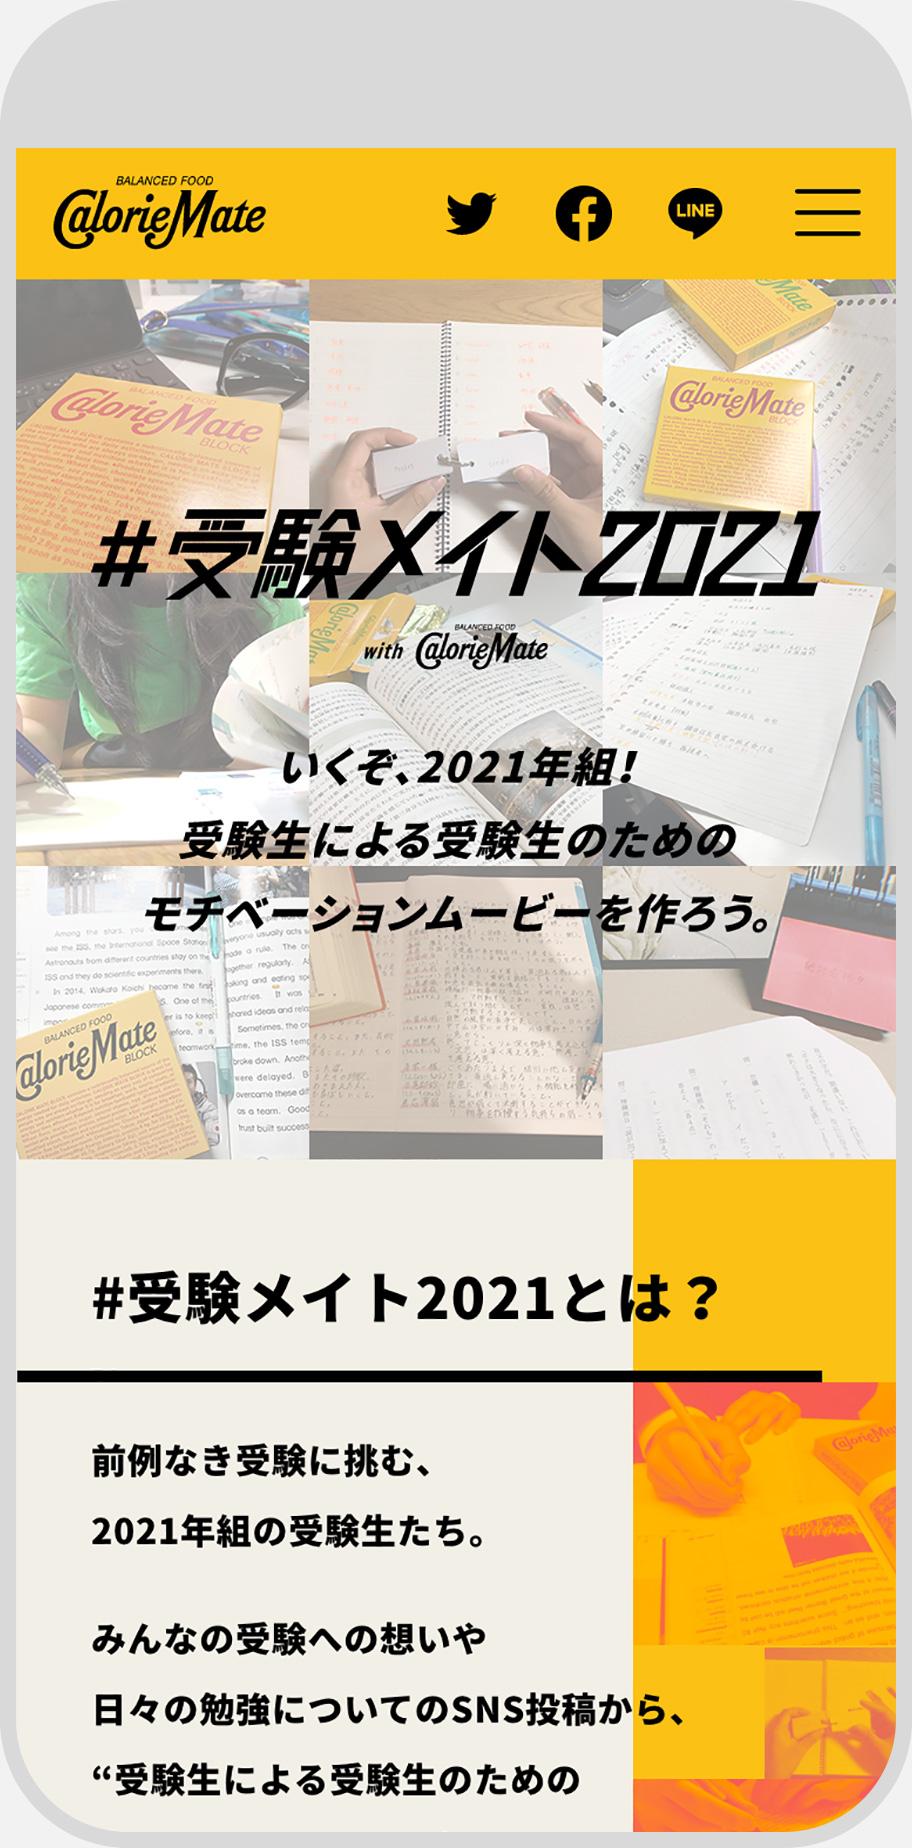 Jukenmate 2021